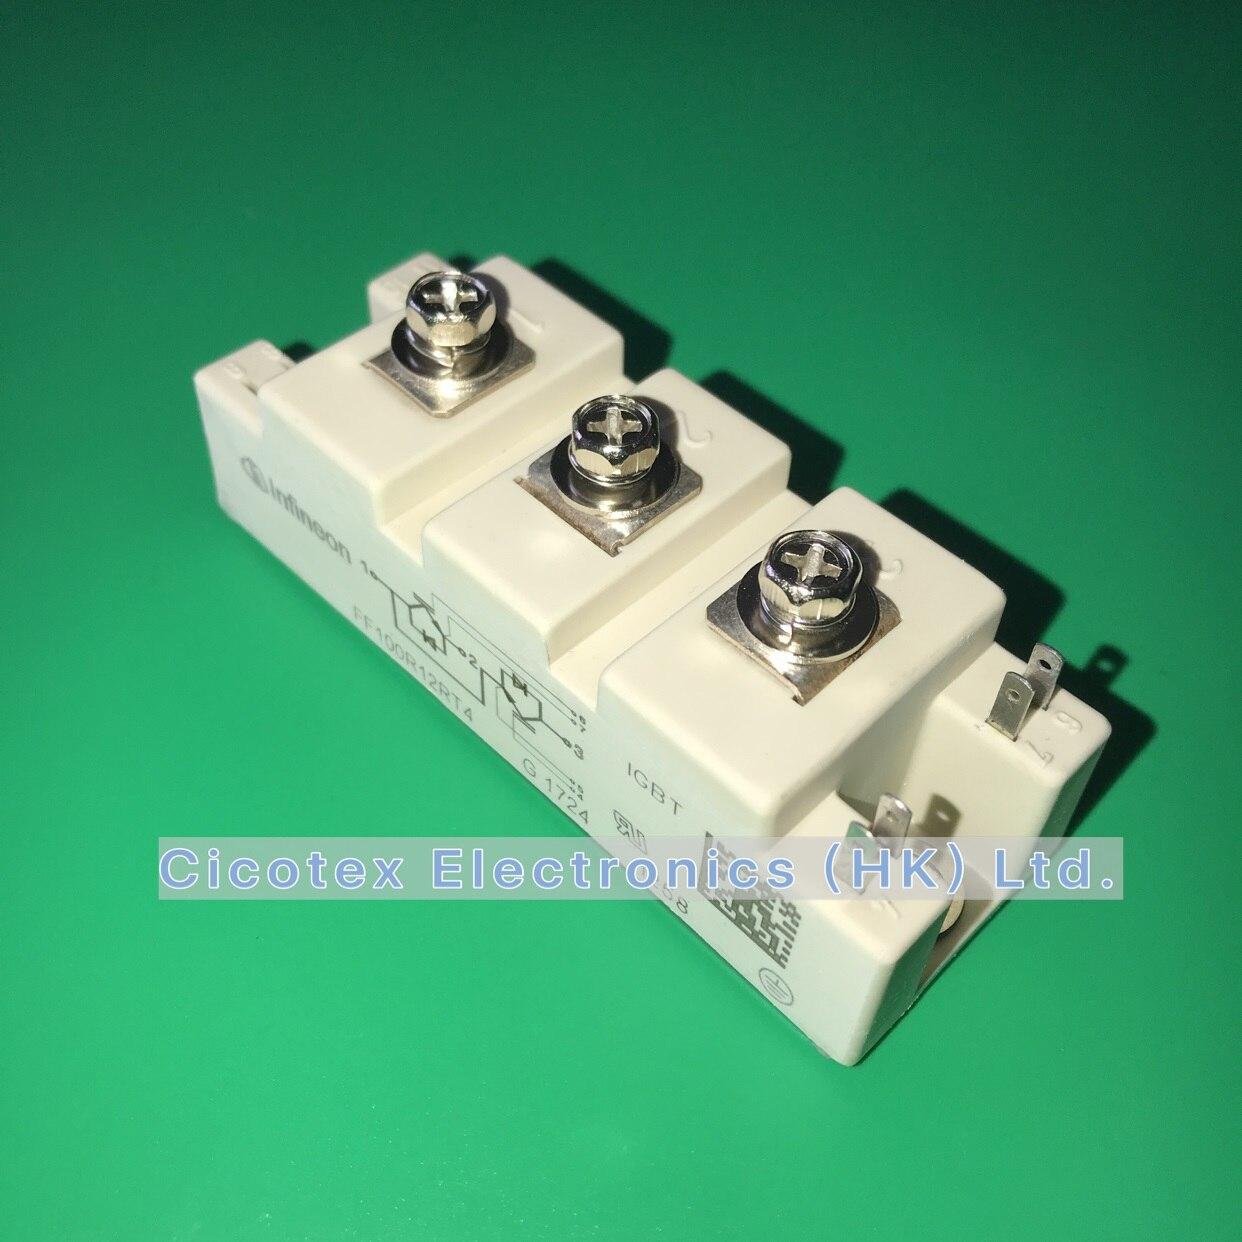 FF100R12RT4 IGBT FF100R 12RT4 para VCES 1200V 100A FF100R12RT4HOSA1